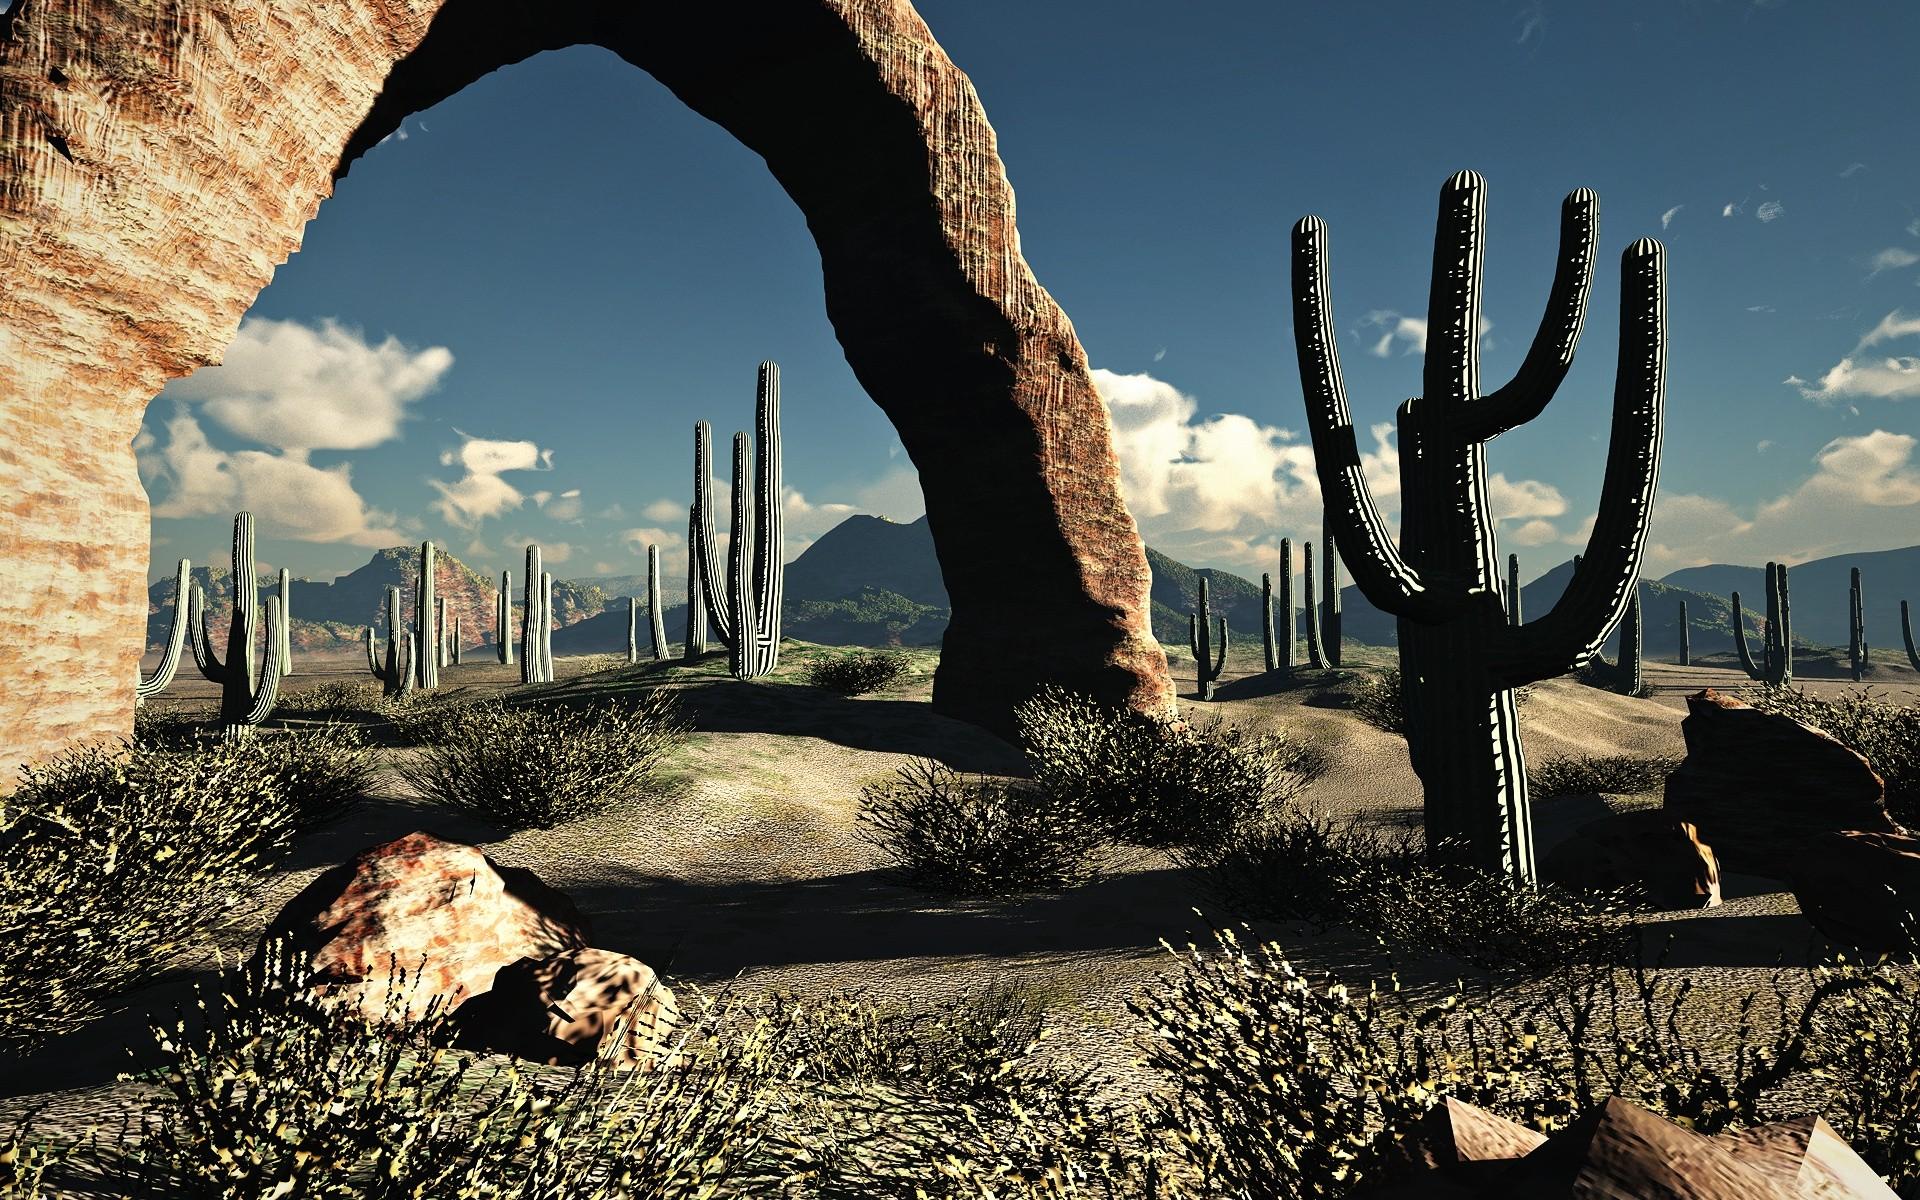 landscapes nature desert cactus wallpaper